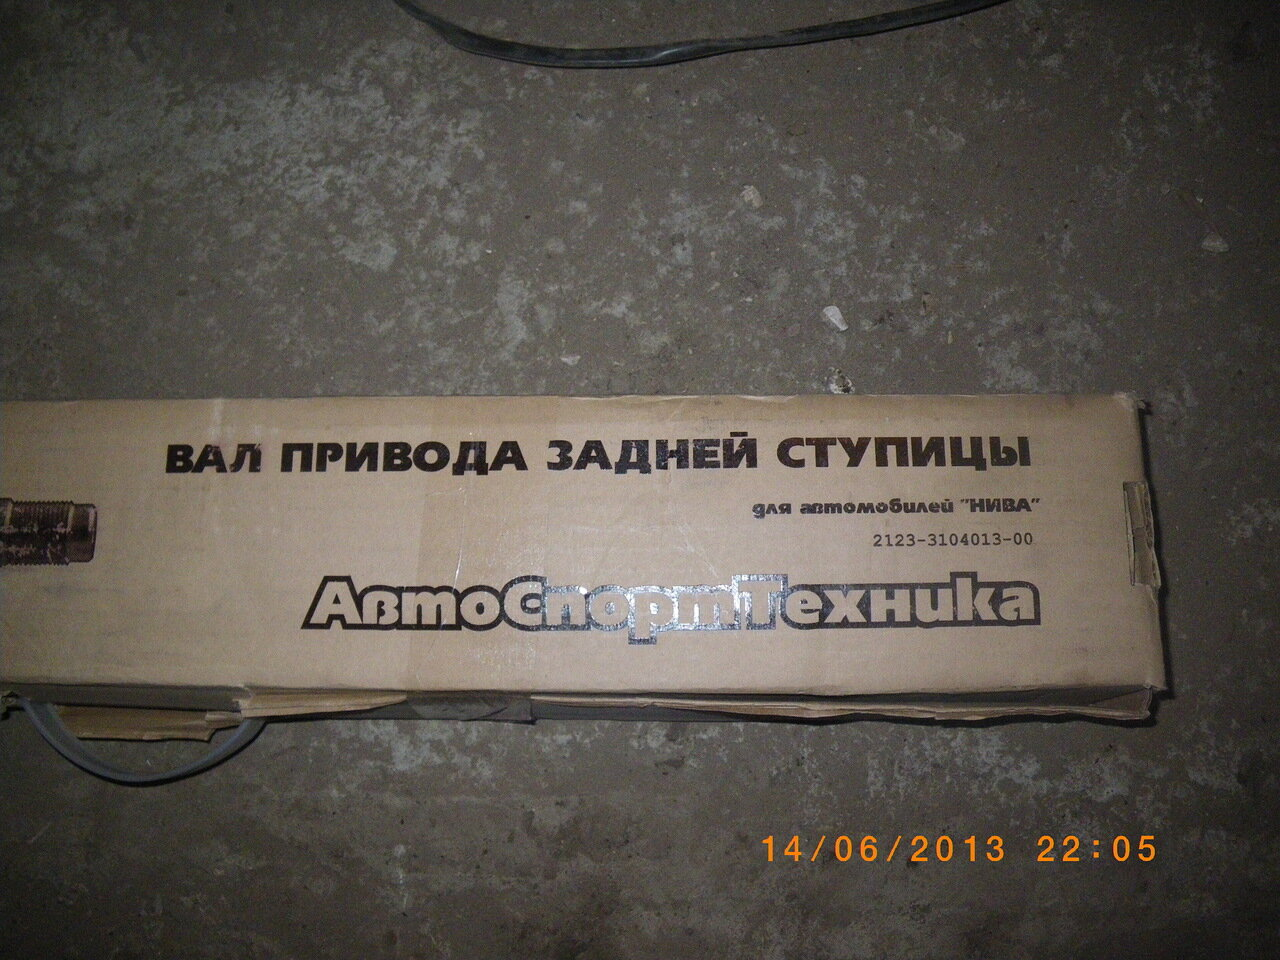 img-fotki.yandex.ru/get/9253/8427629.aa/0_8208d_3f5b1b6c_XXXL.jpg